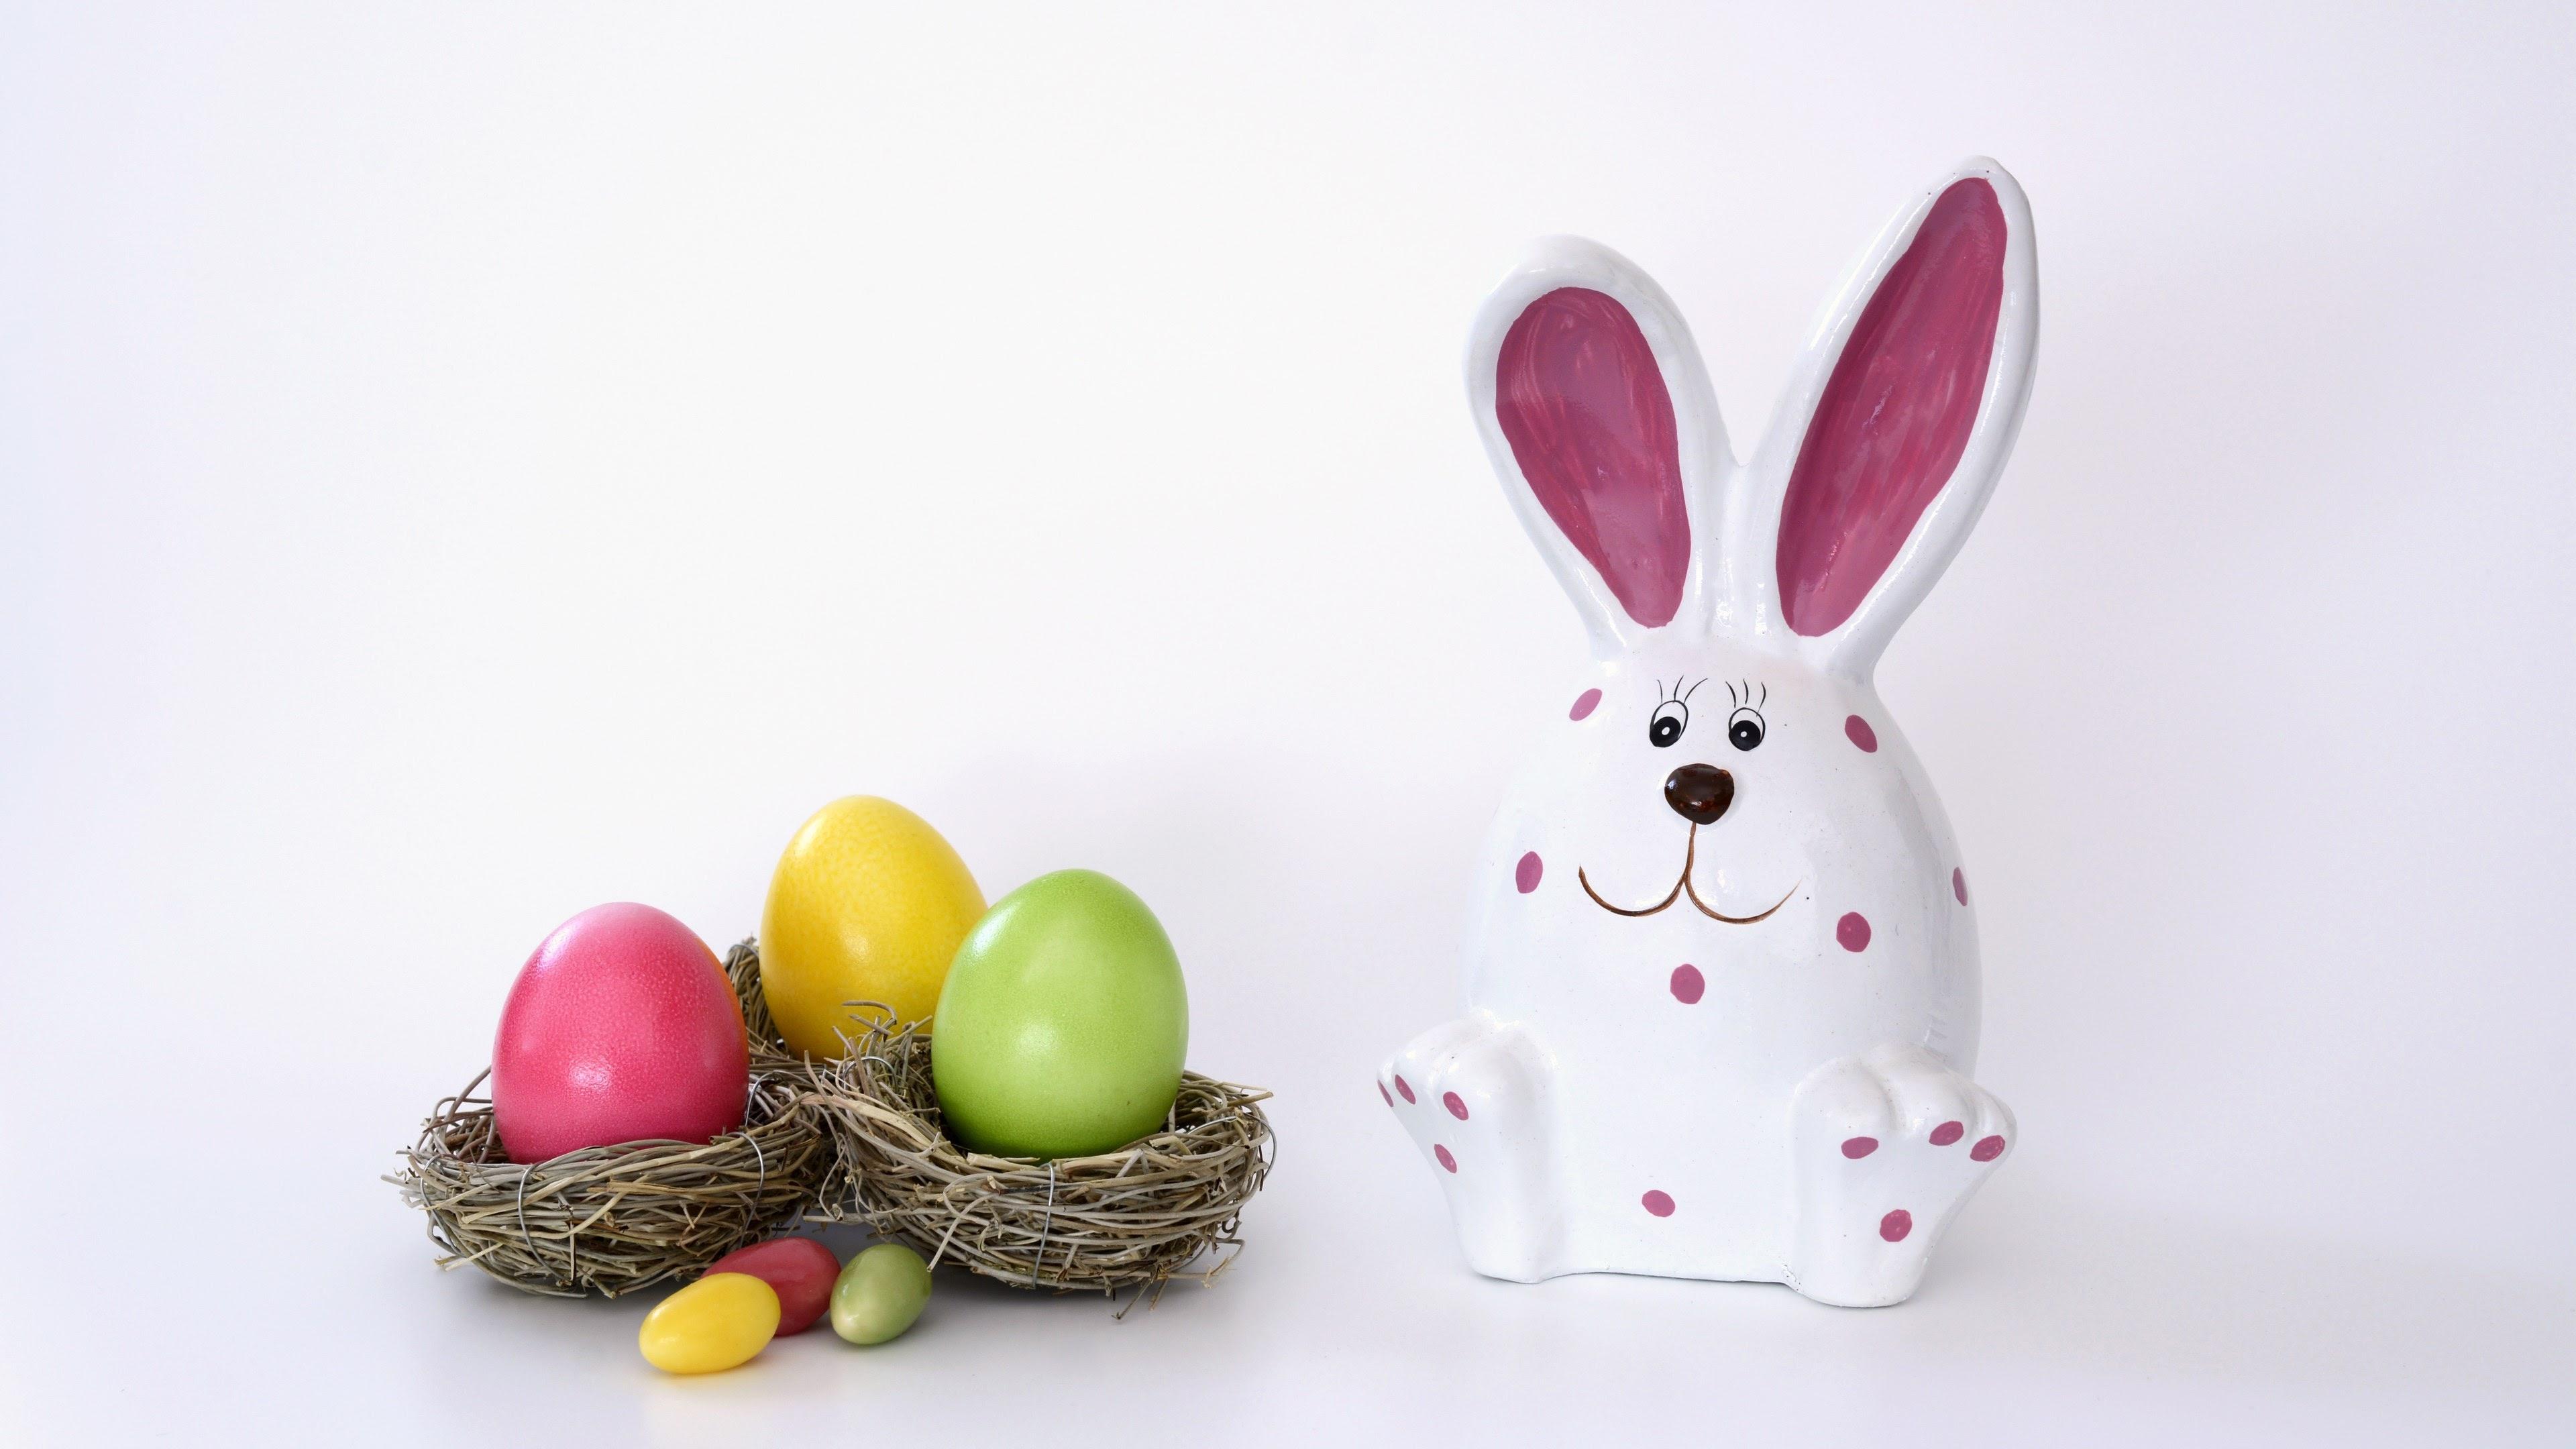 bunny 2016 easter 4k - photo #1